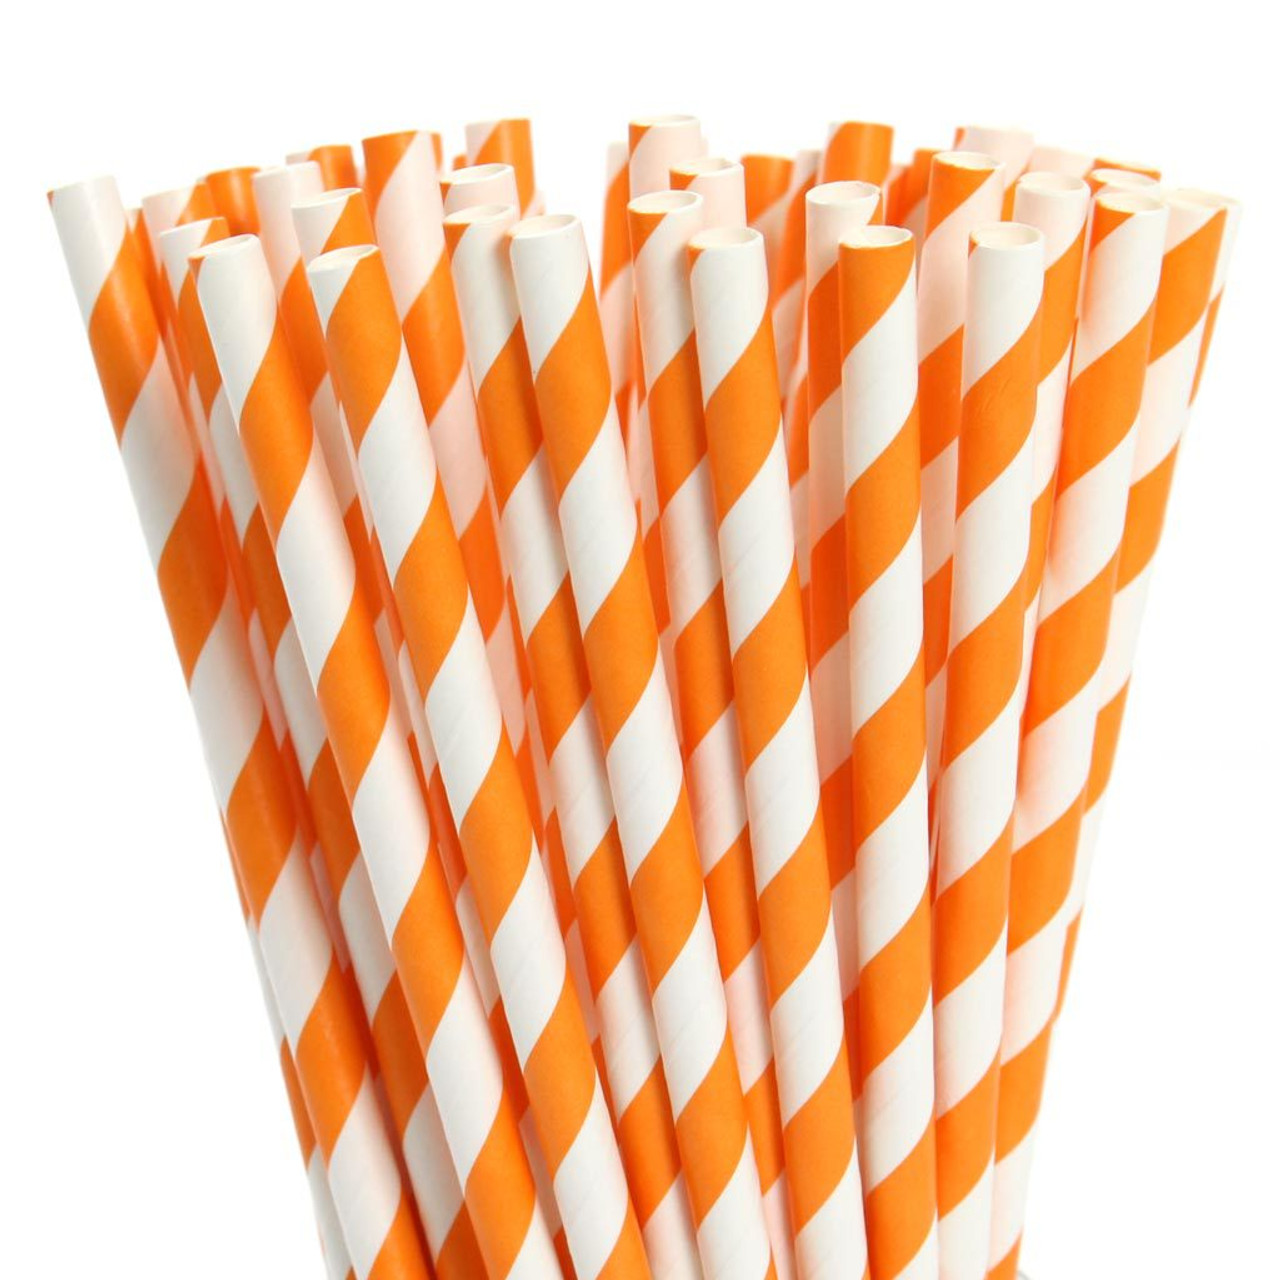 Tall Paper Straws - Bright Orange Stripes